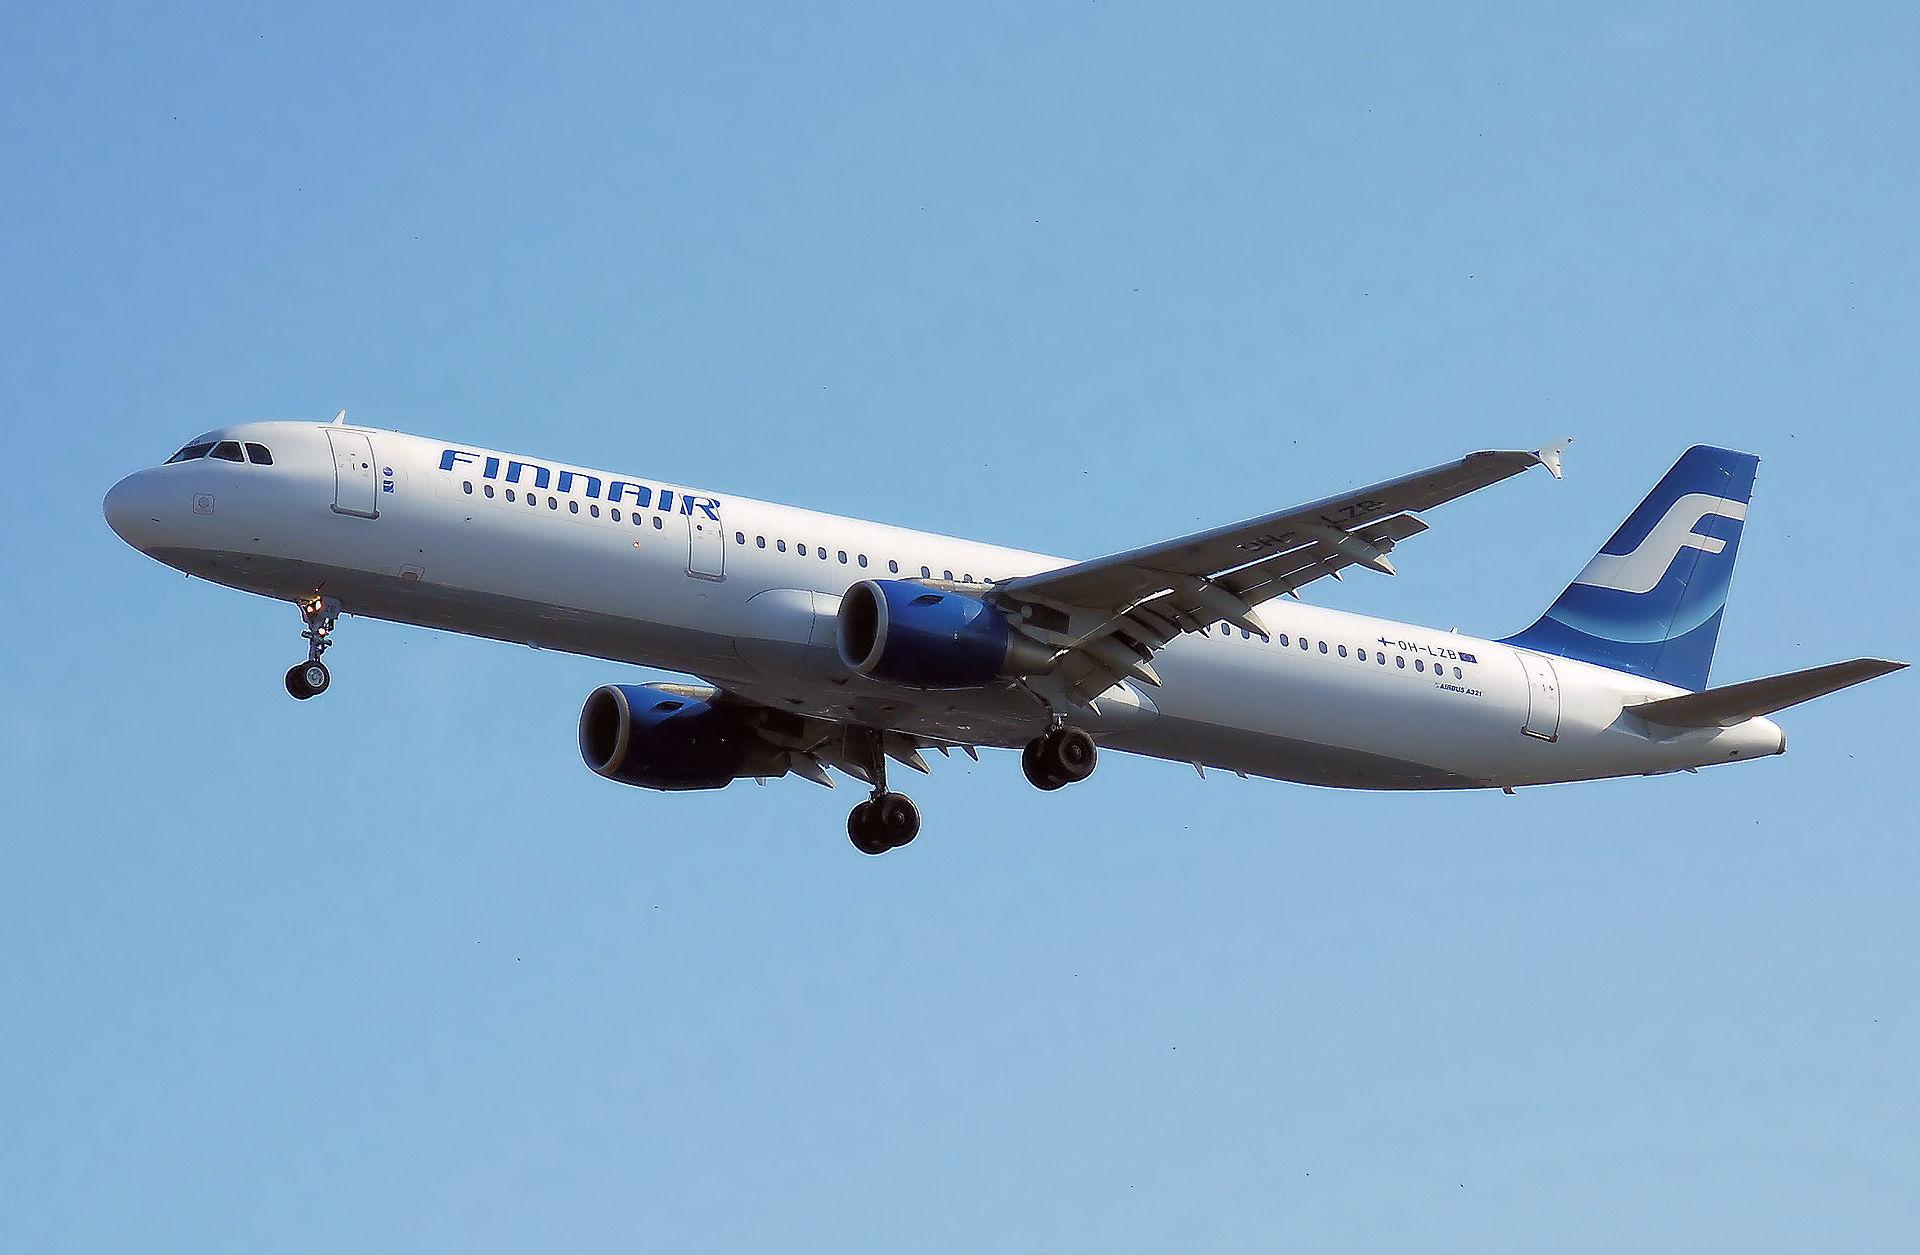 Www.Finnair,Fi